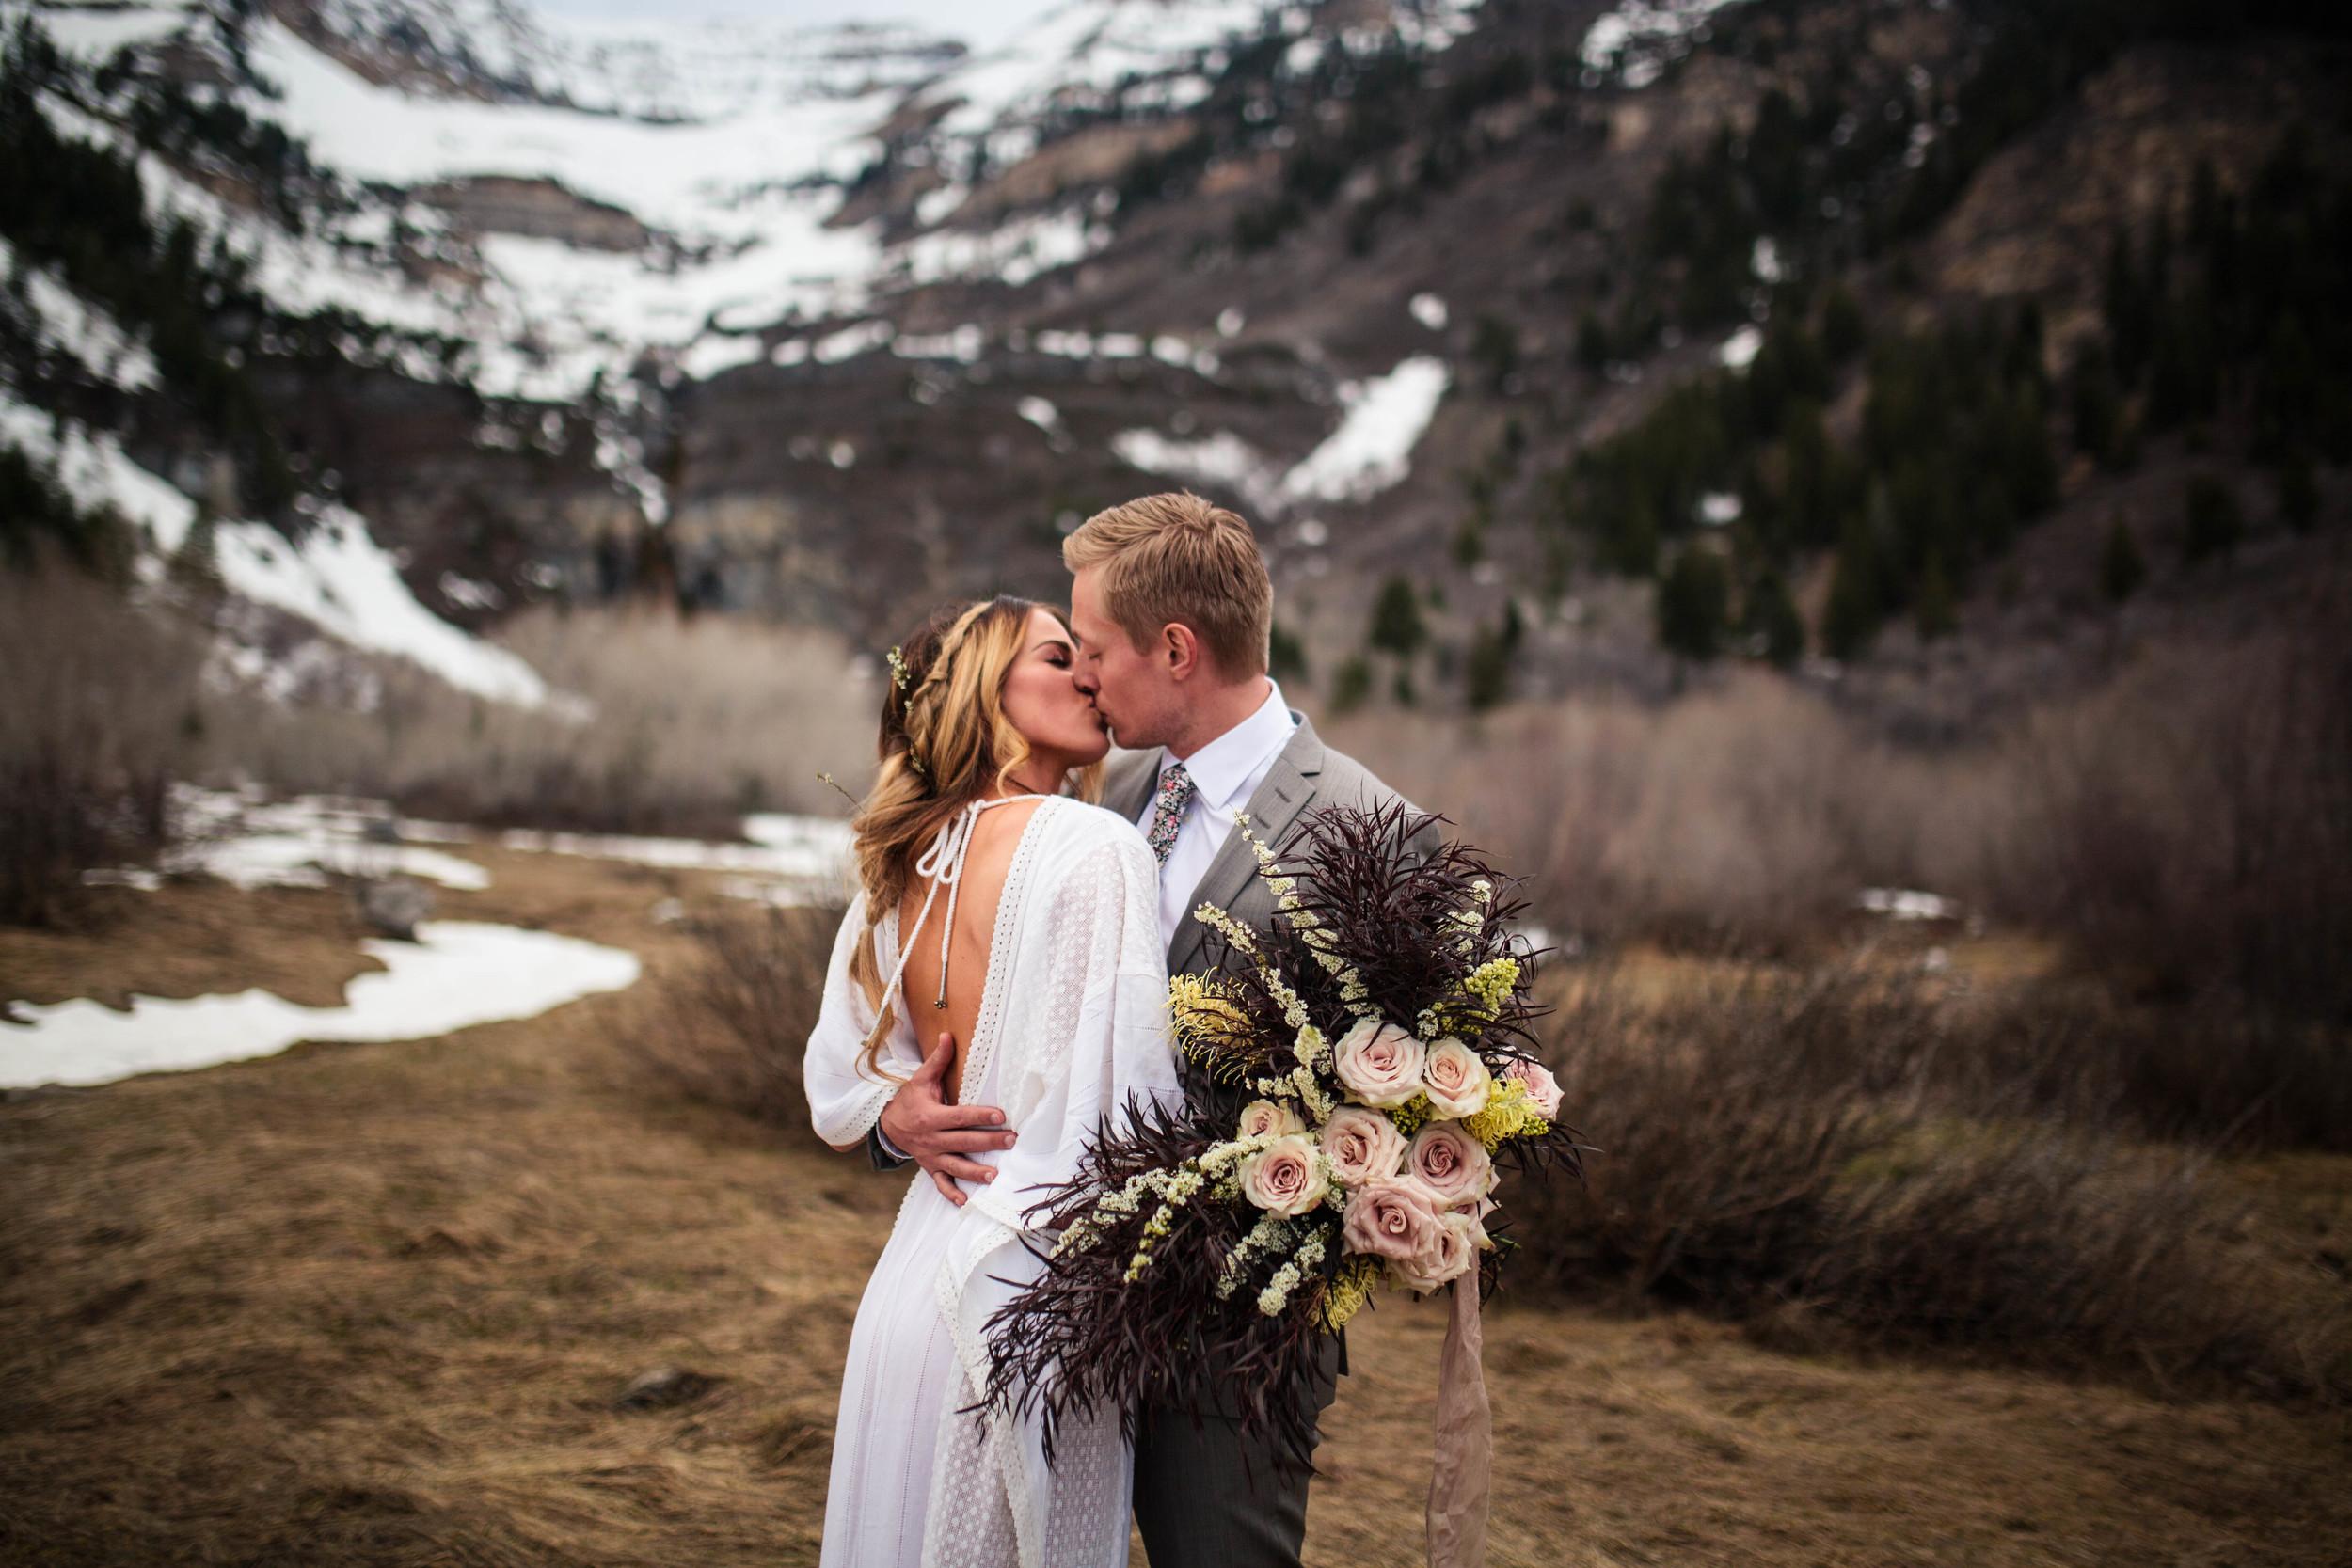 Candace & Thomas - Stylized Elopement - Whitney Justesen Photography-32.jpg